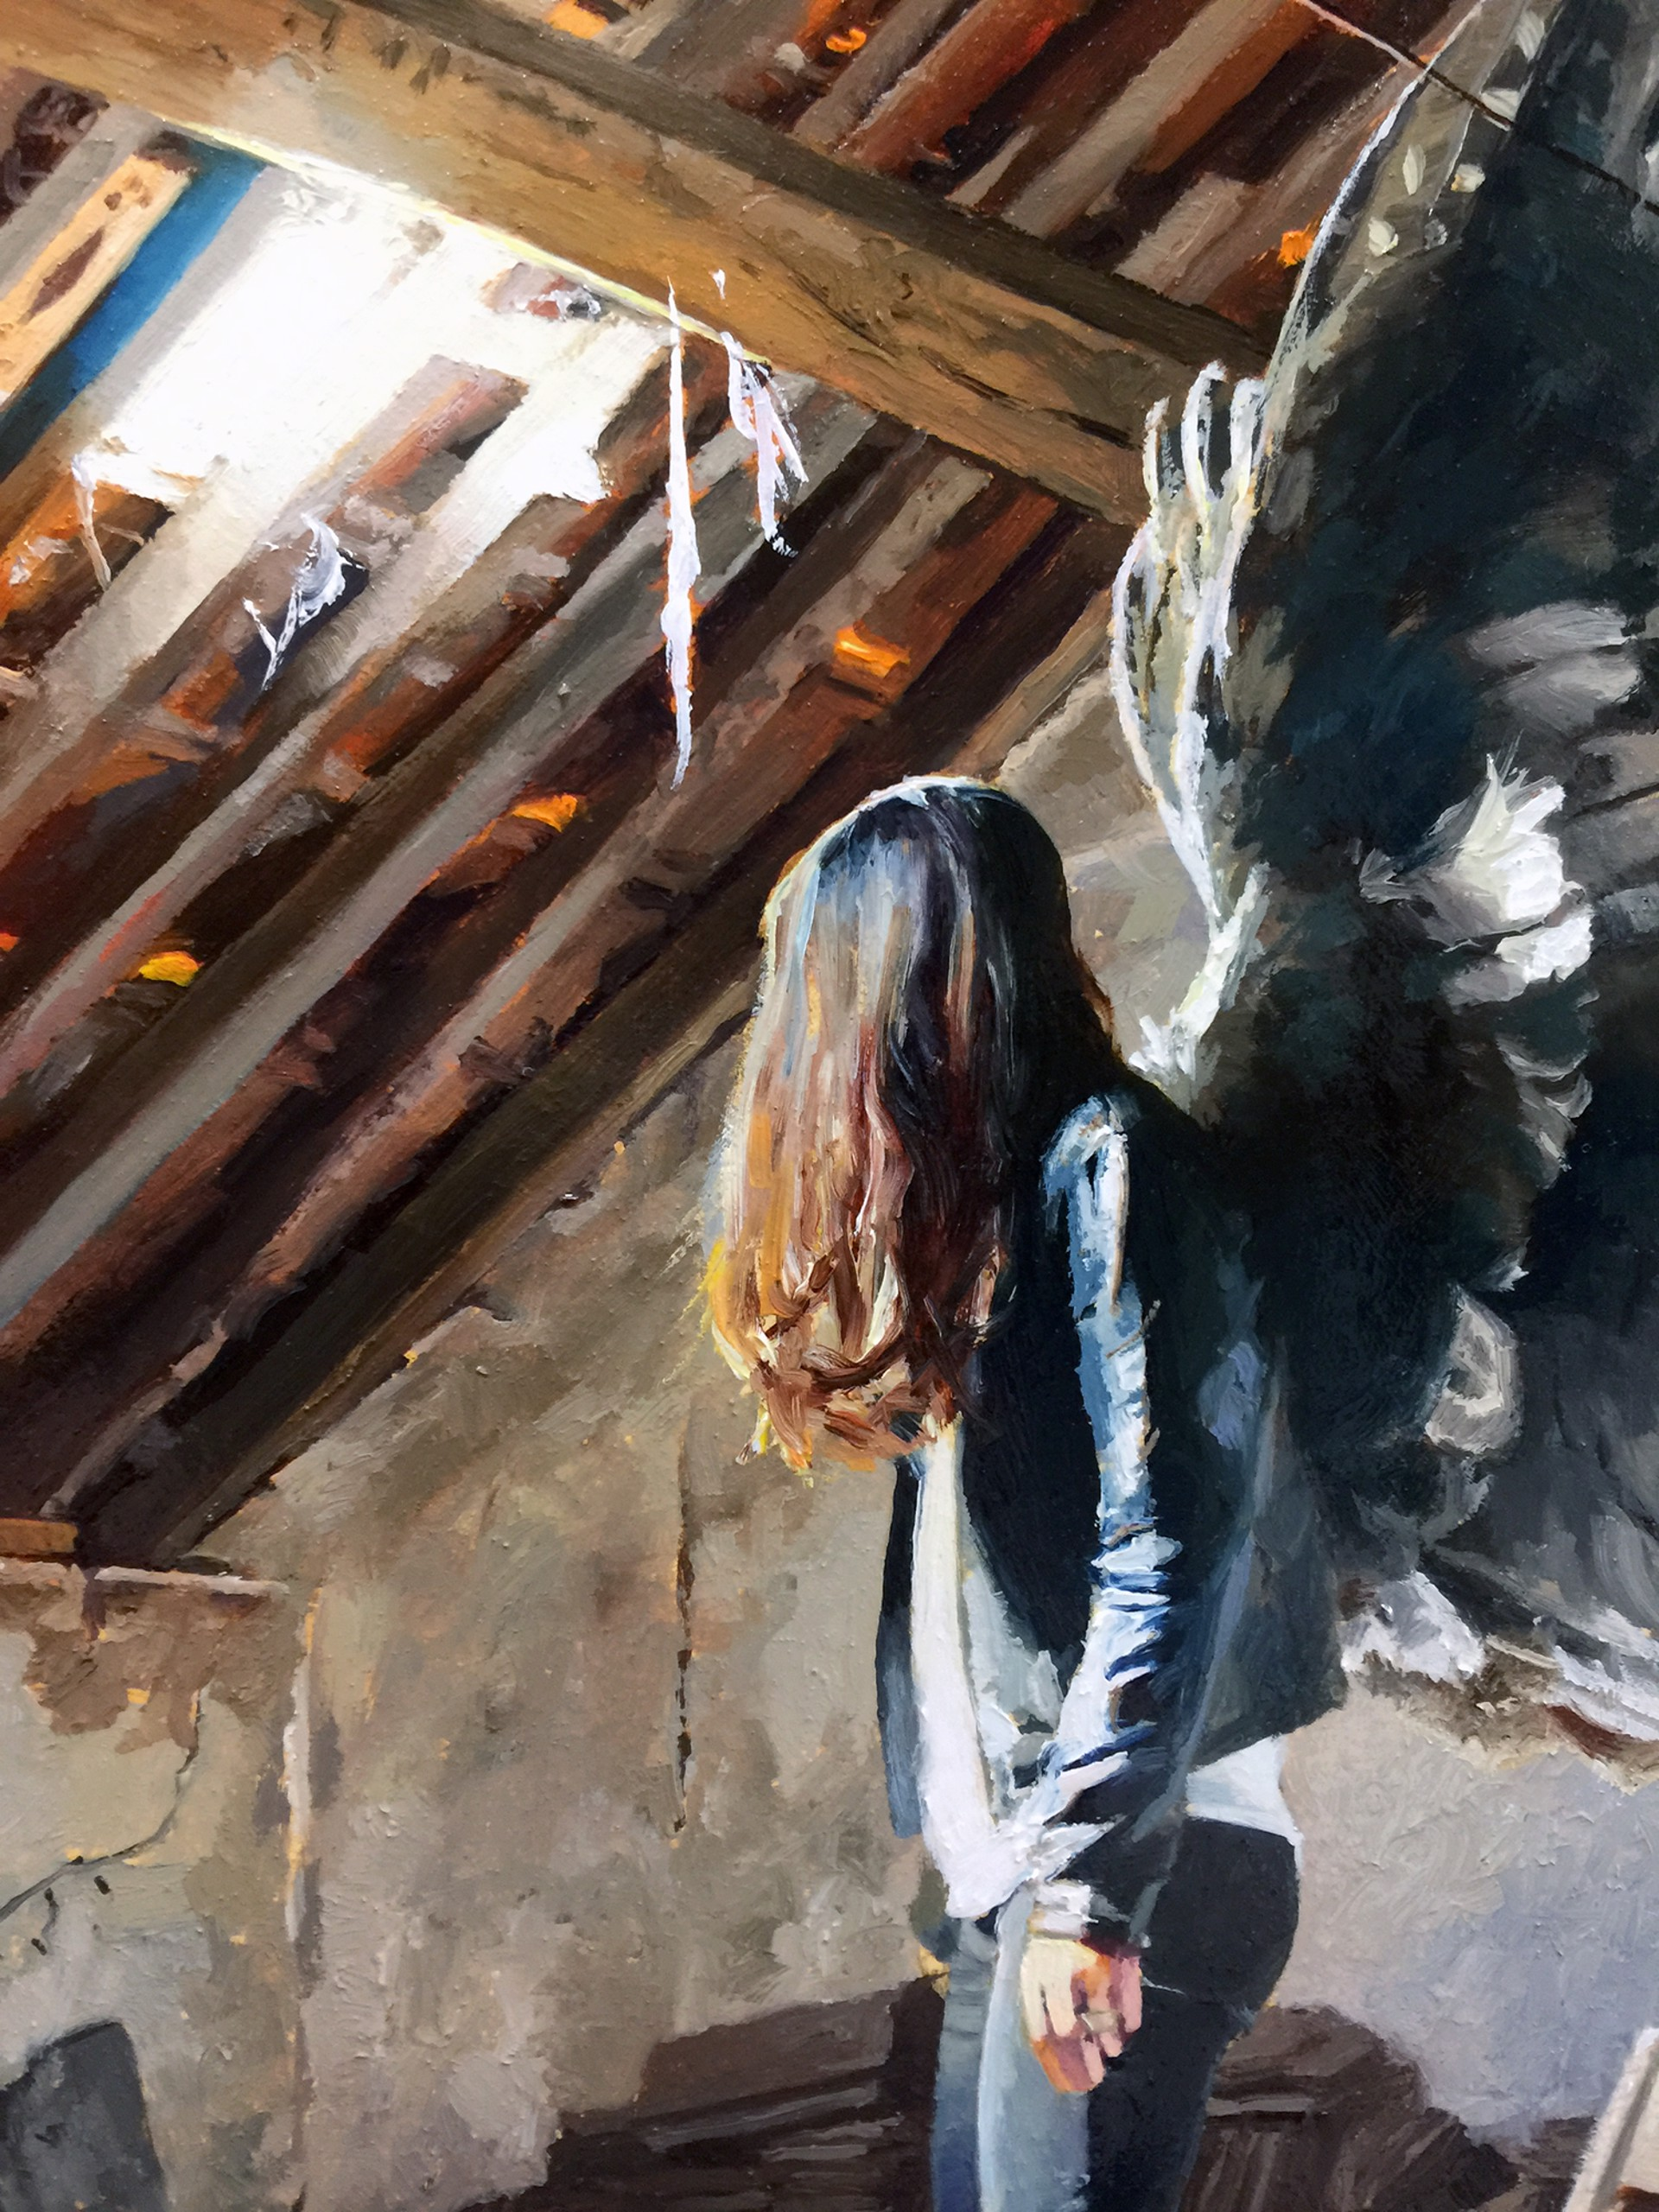 Untold by Linda Adair